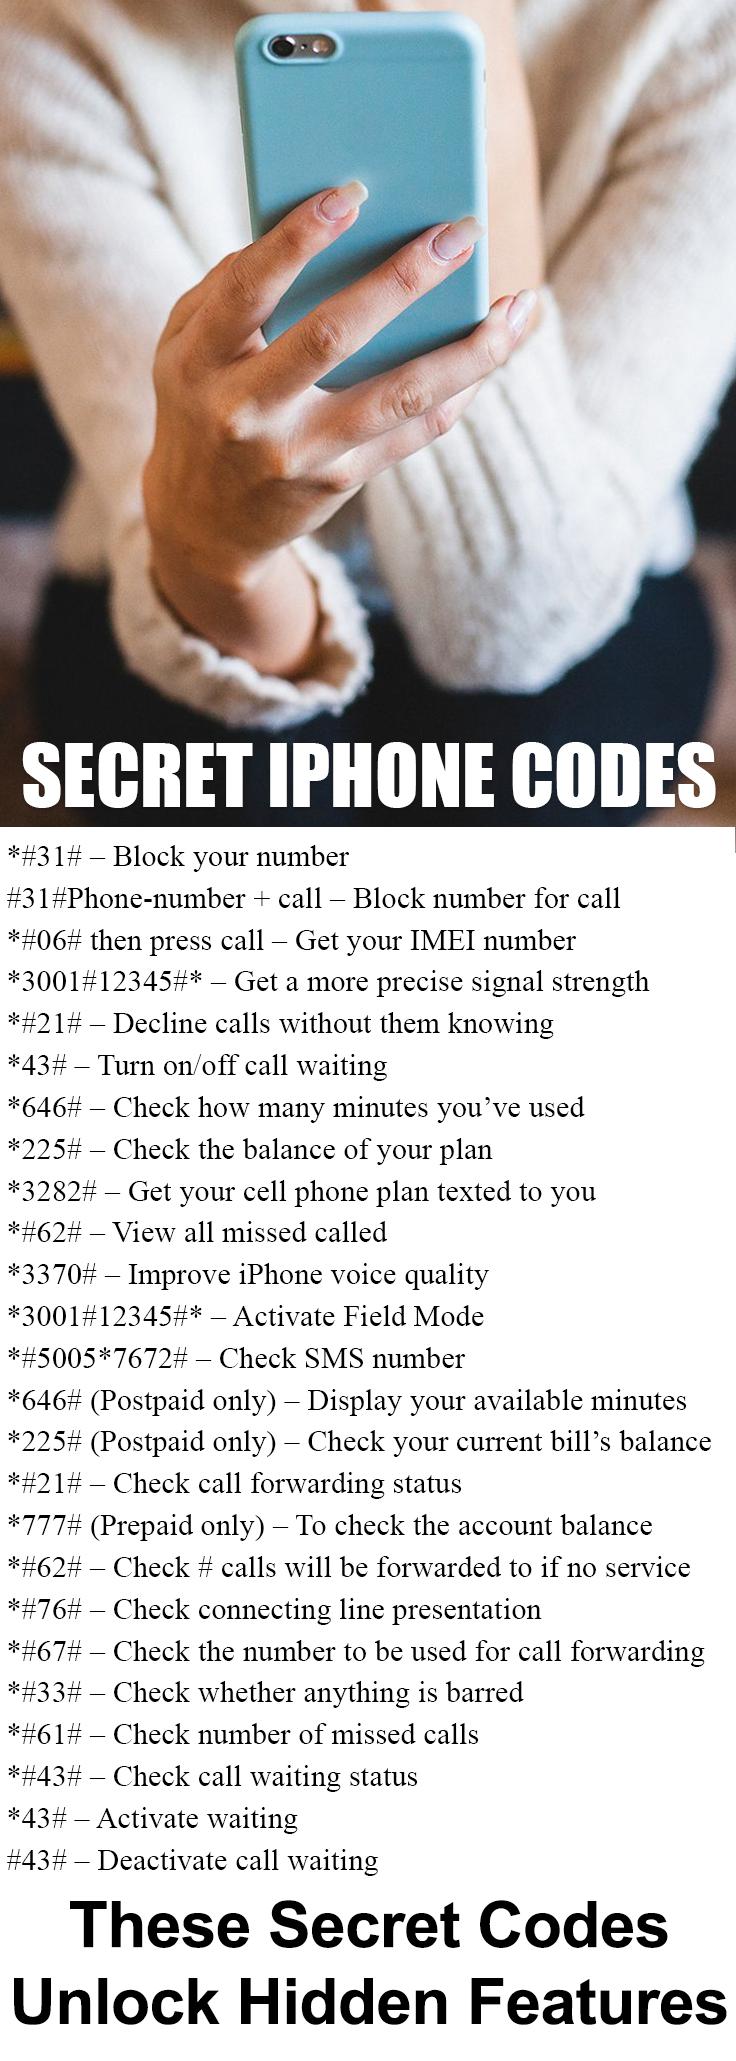 Mom comp blocked me how to unlock 90